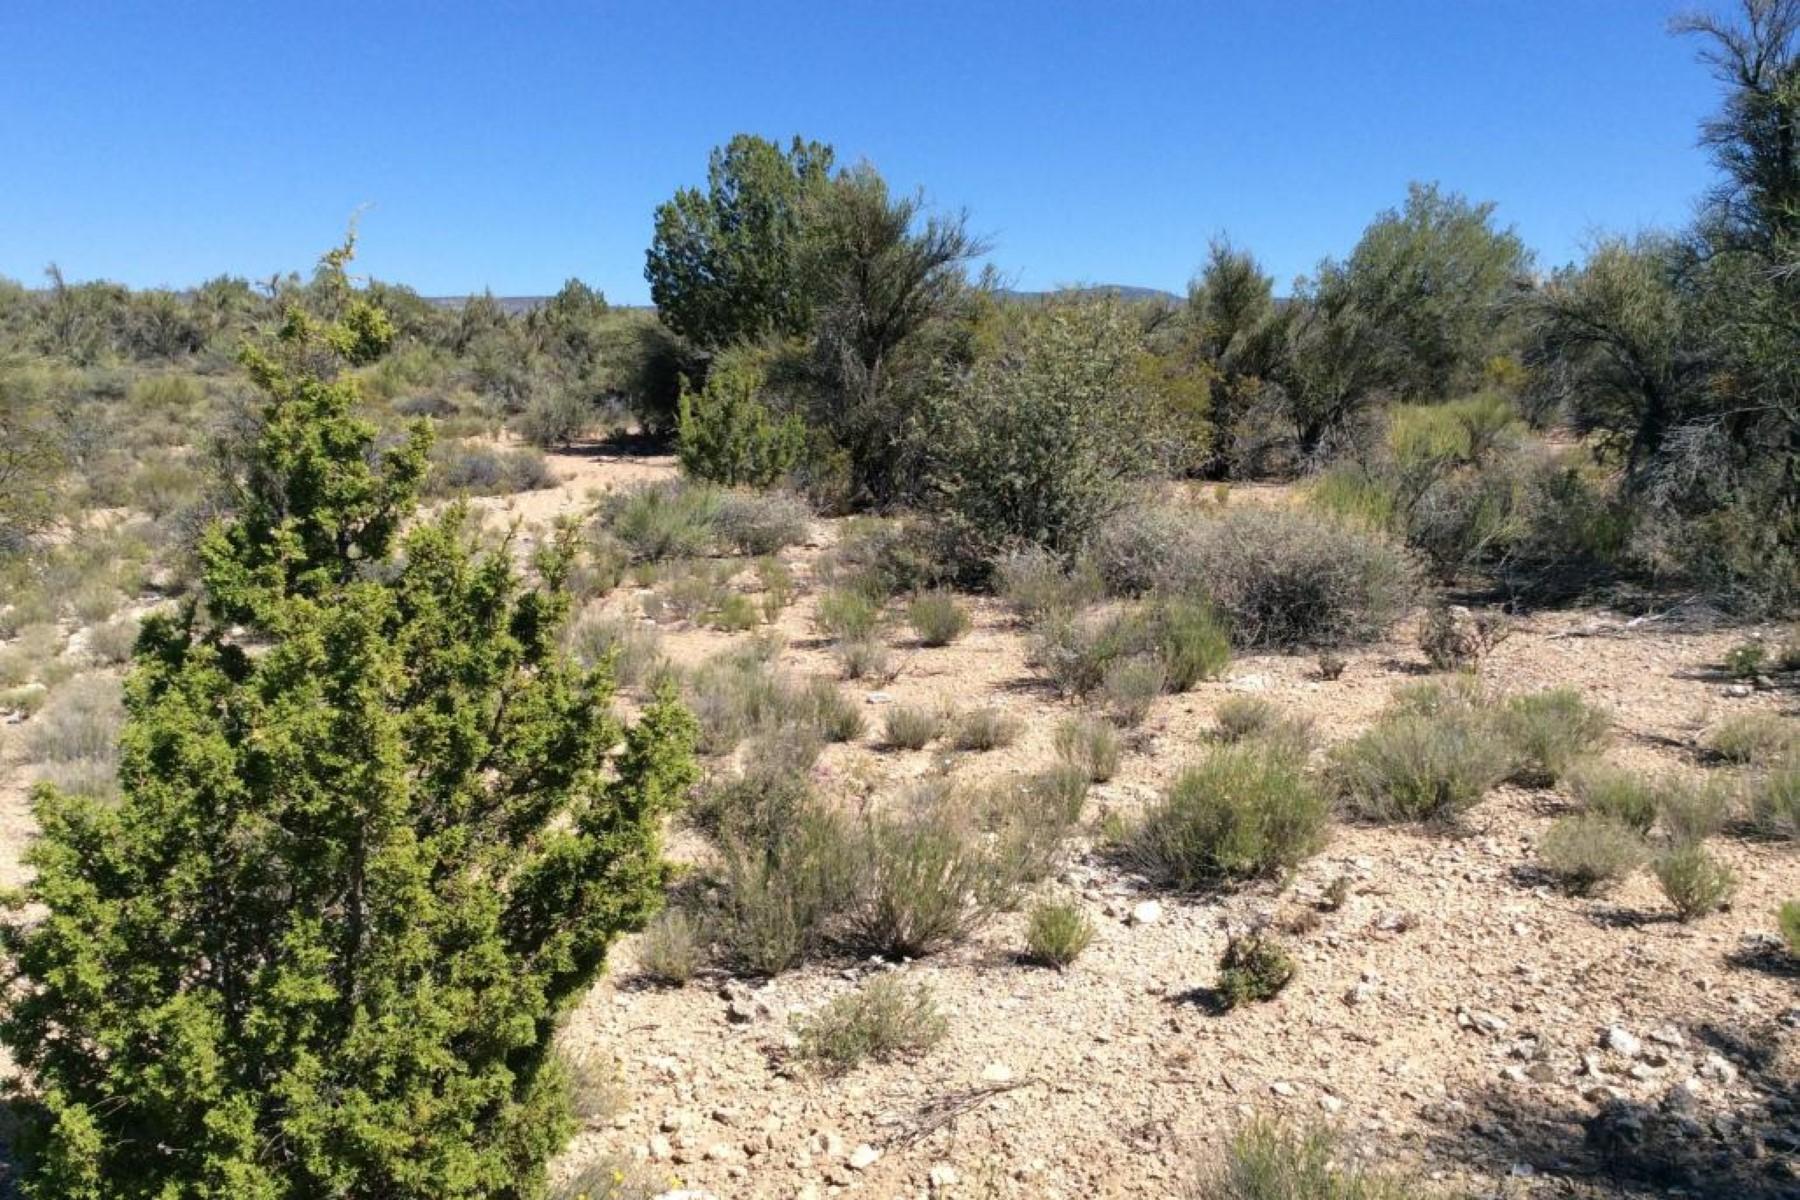 Terreno para Venda às Exceptional level lot on a cul-de-sac 6625 N Falcon View Drive Rimrock, Arizona, 86335 Estados Unidos